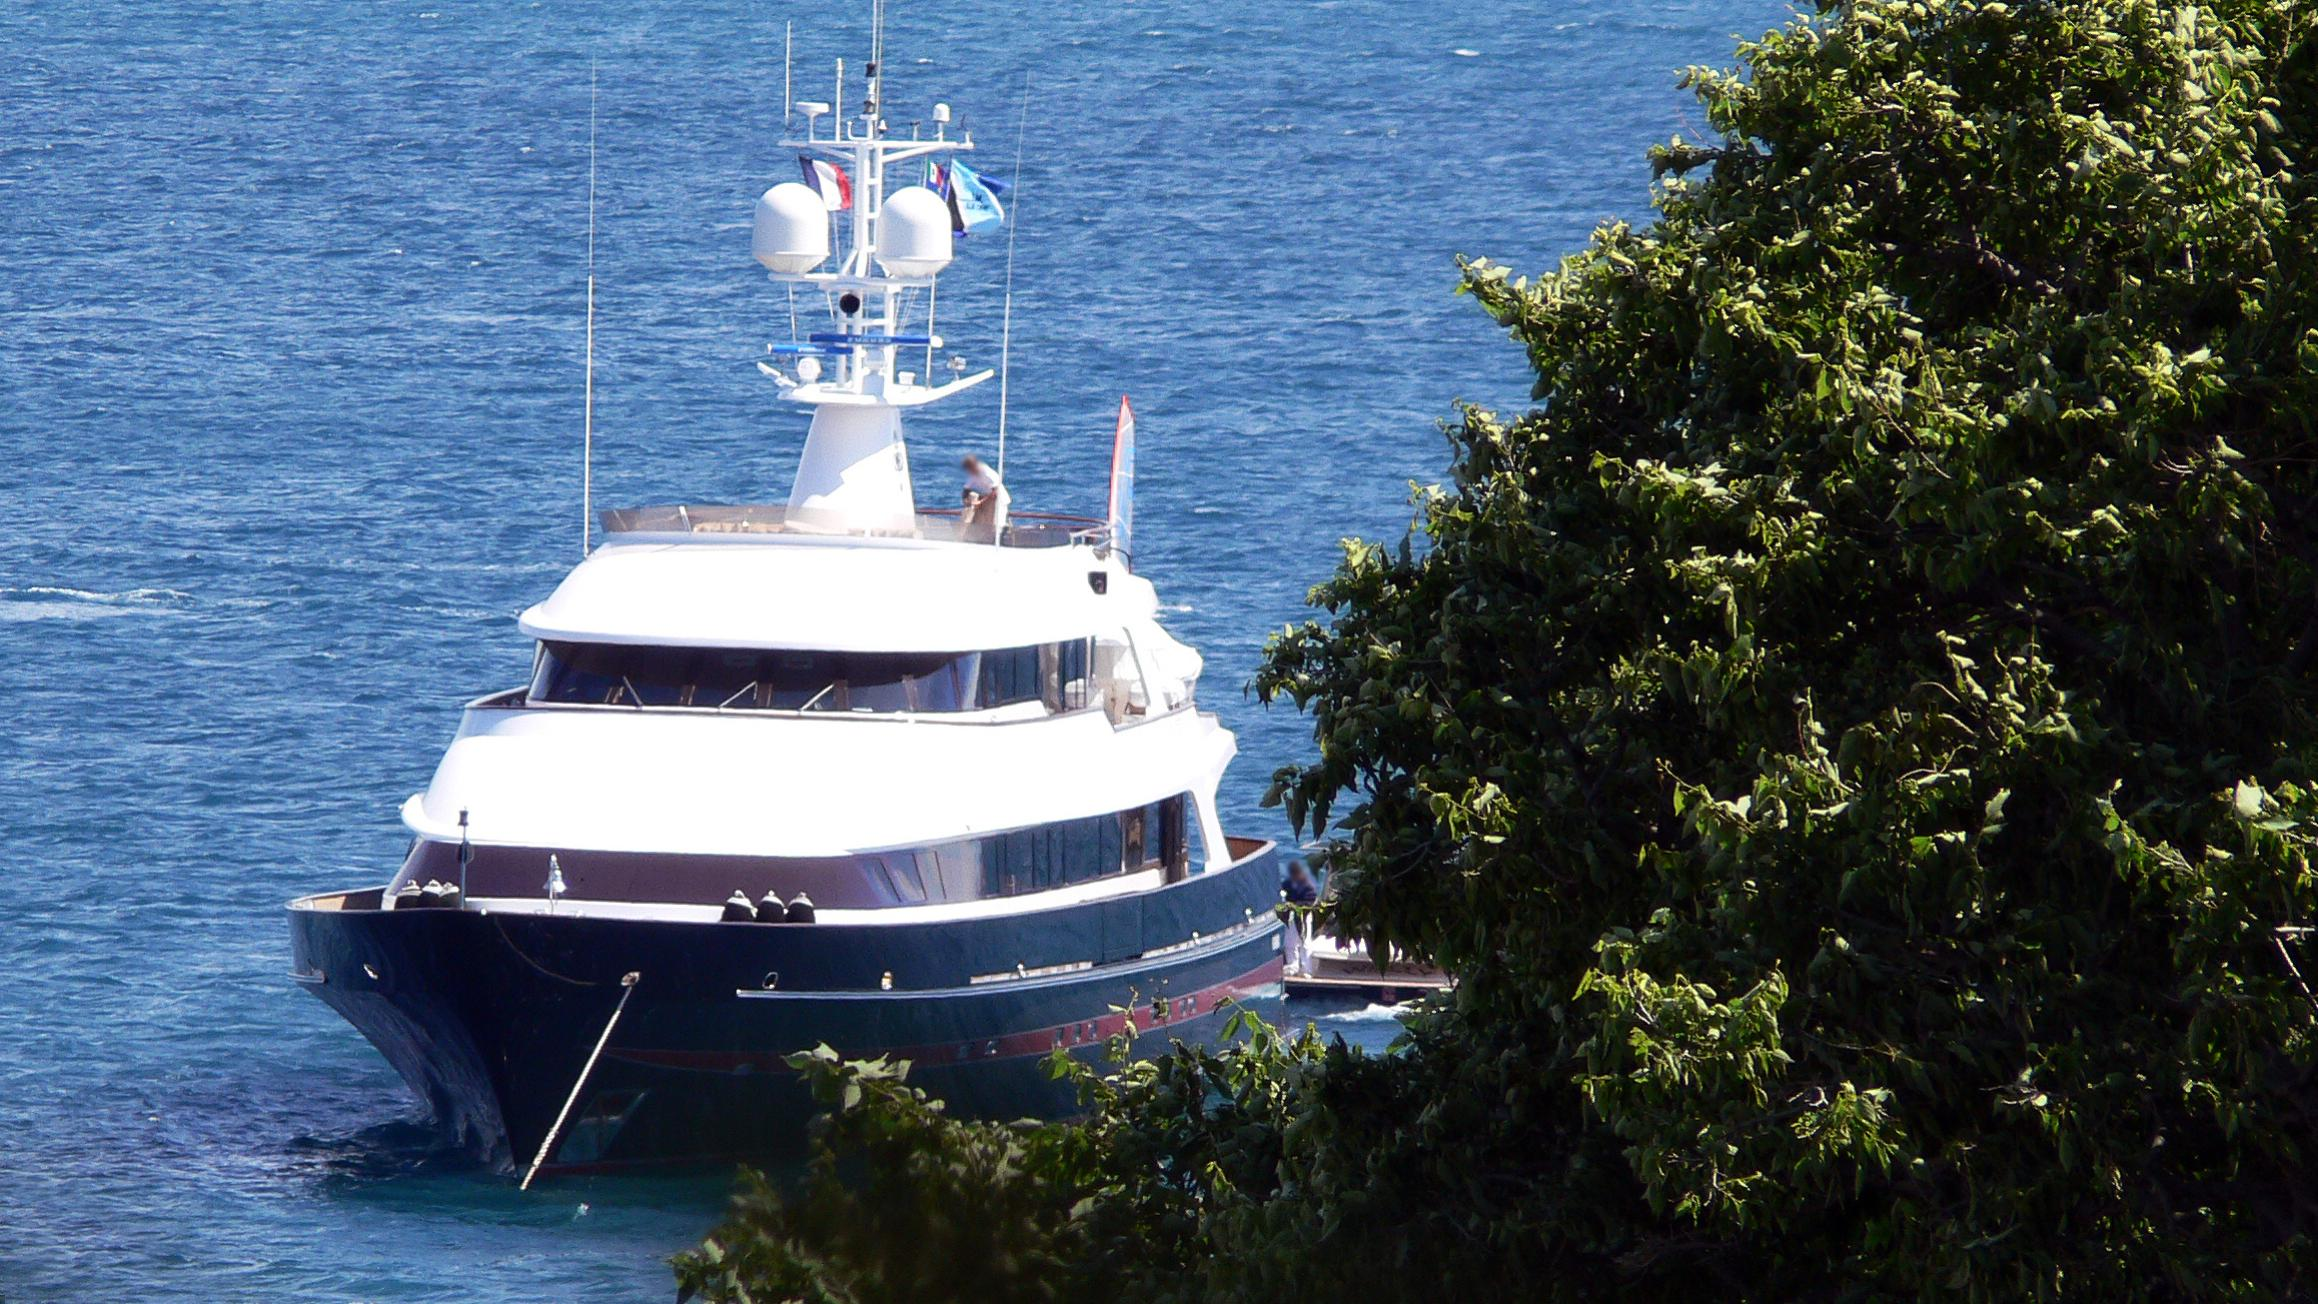 tm-blue-one-motor-yacht-picchiotti-1988-46m-bow